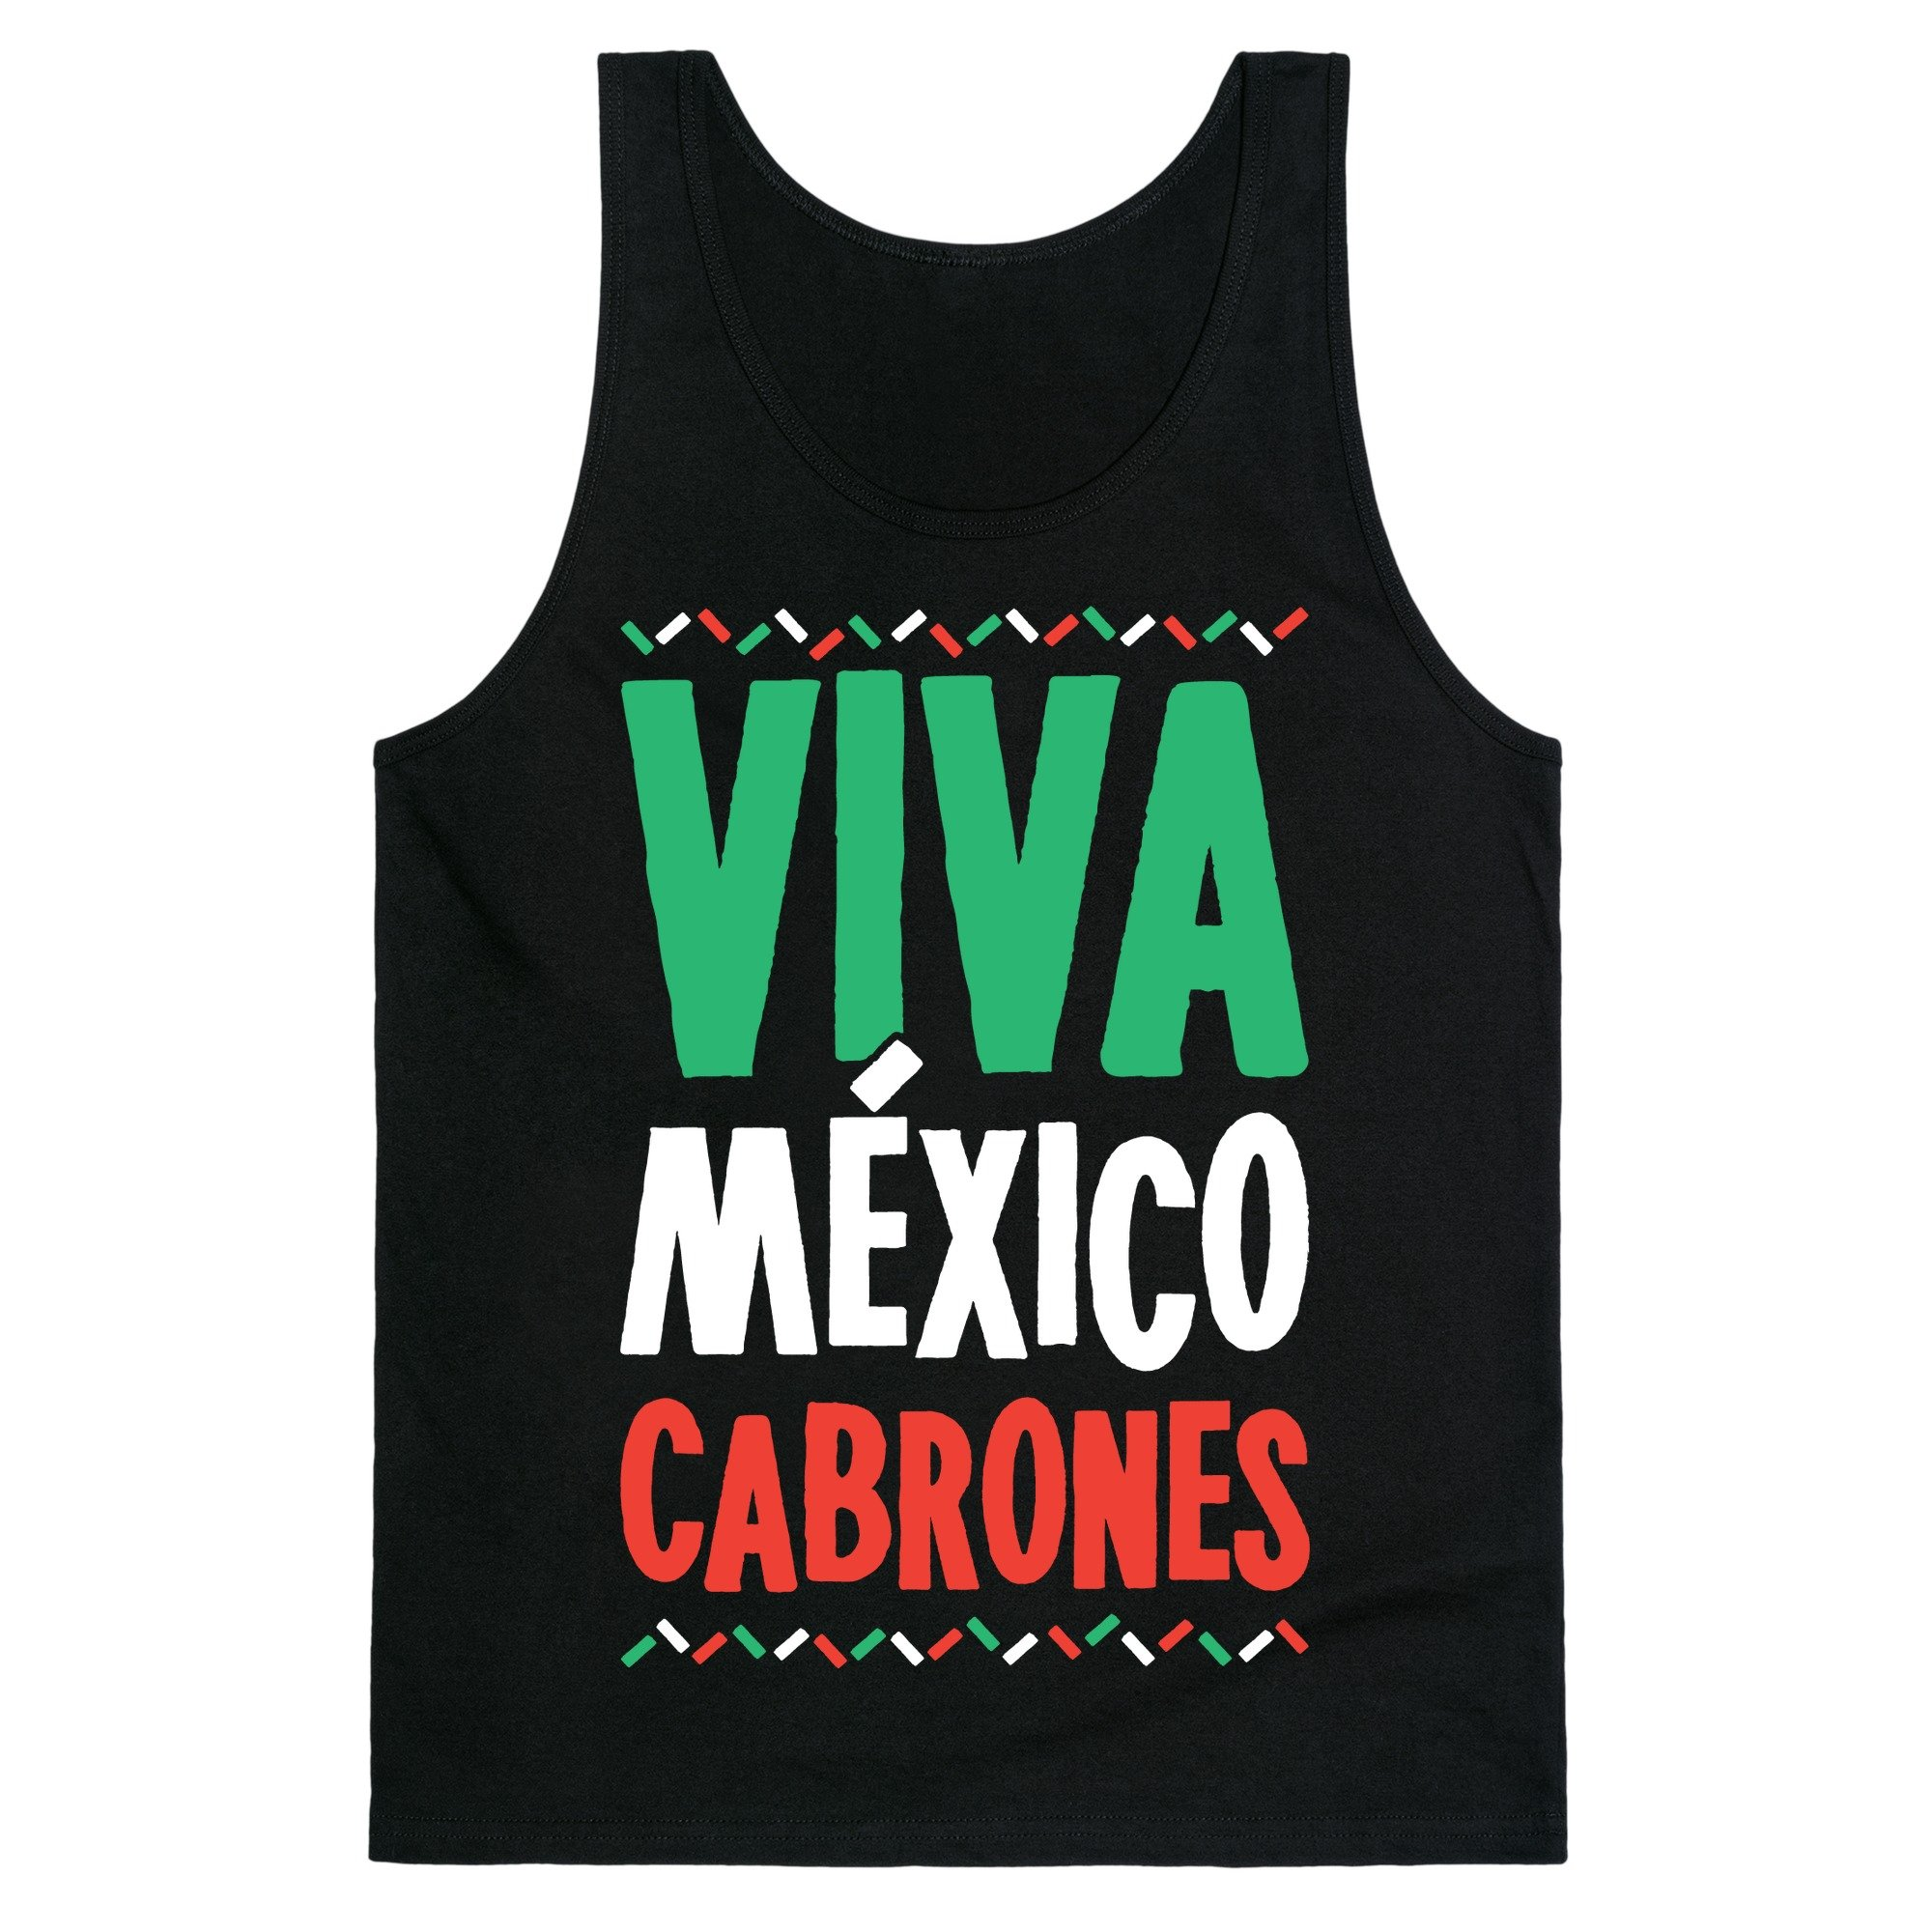 Viva Mexico Cabrones S Unisex Tank Shirts